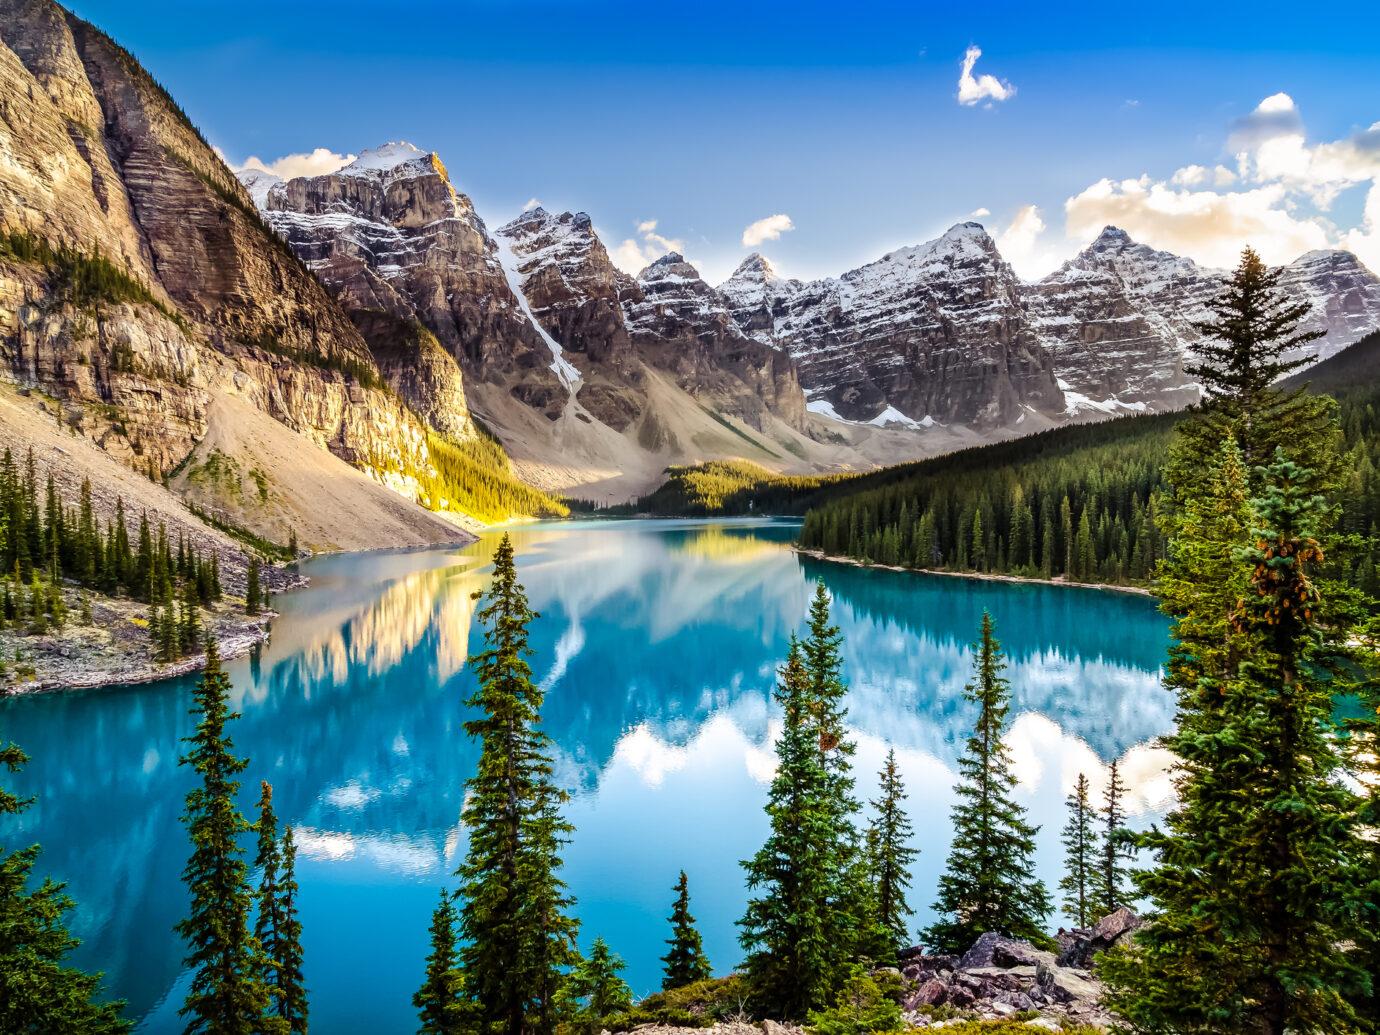 Landscape sunset view of Morain lake and mountain range, Alberta, Canada